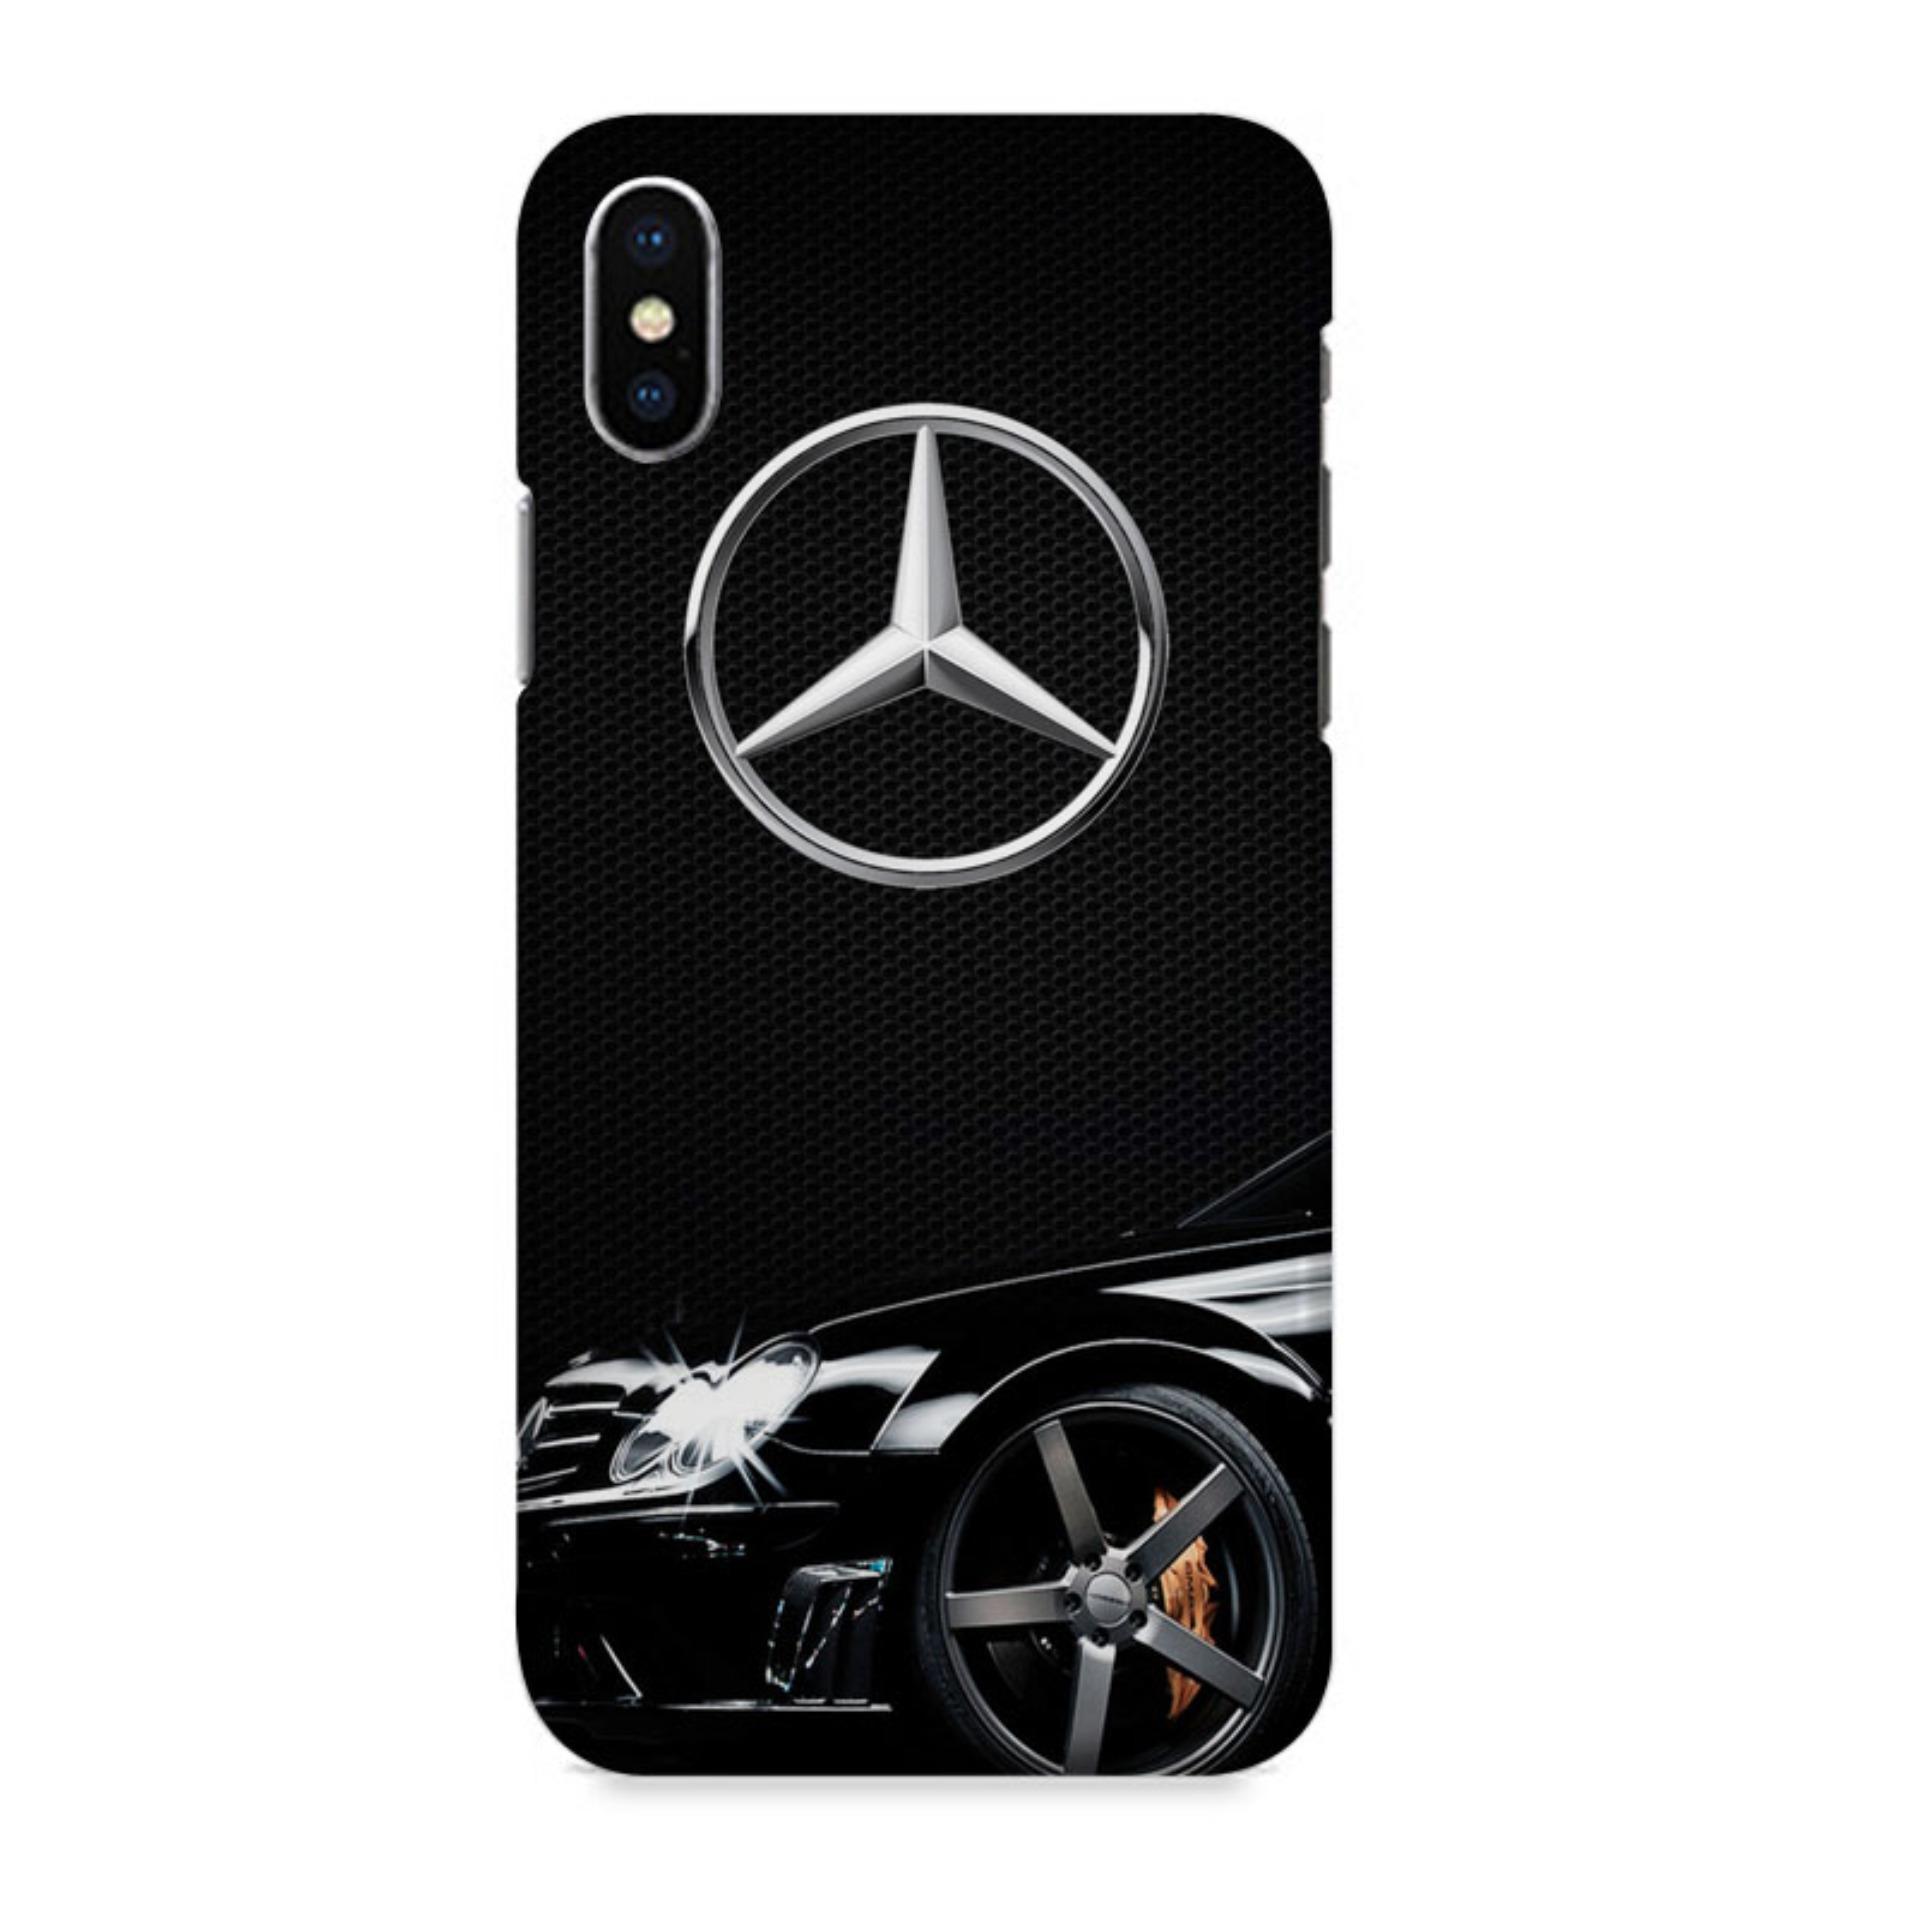 Samsung Galaxy S6 Edge. Source · Indocustomcase Mercedes Benz Car Hard Casing .